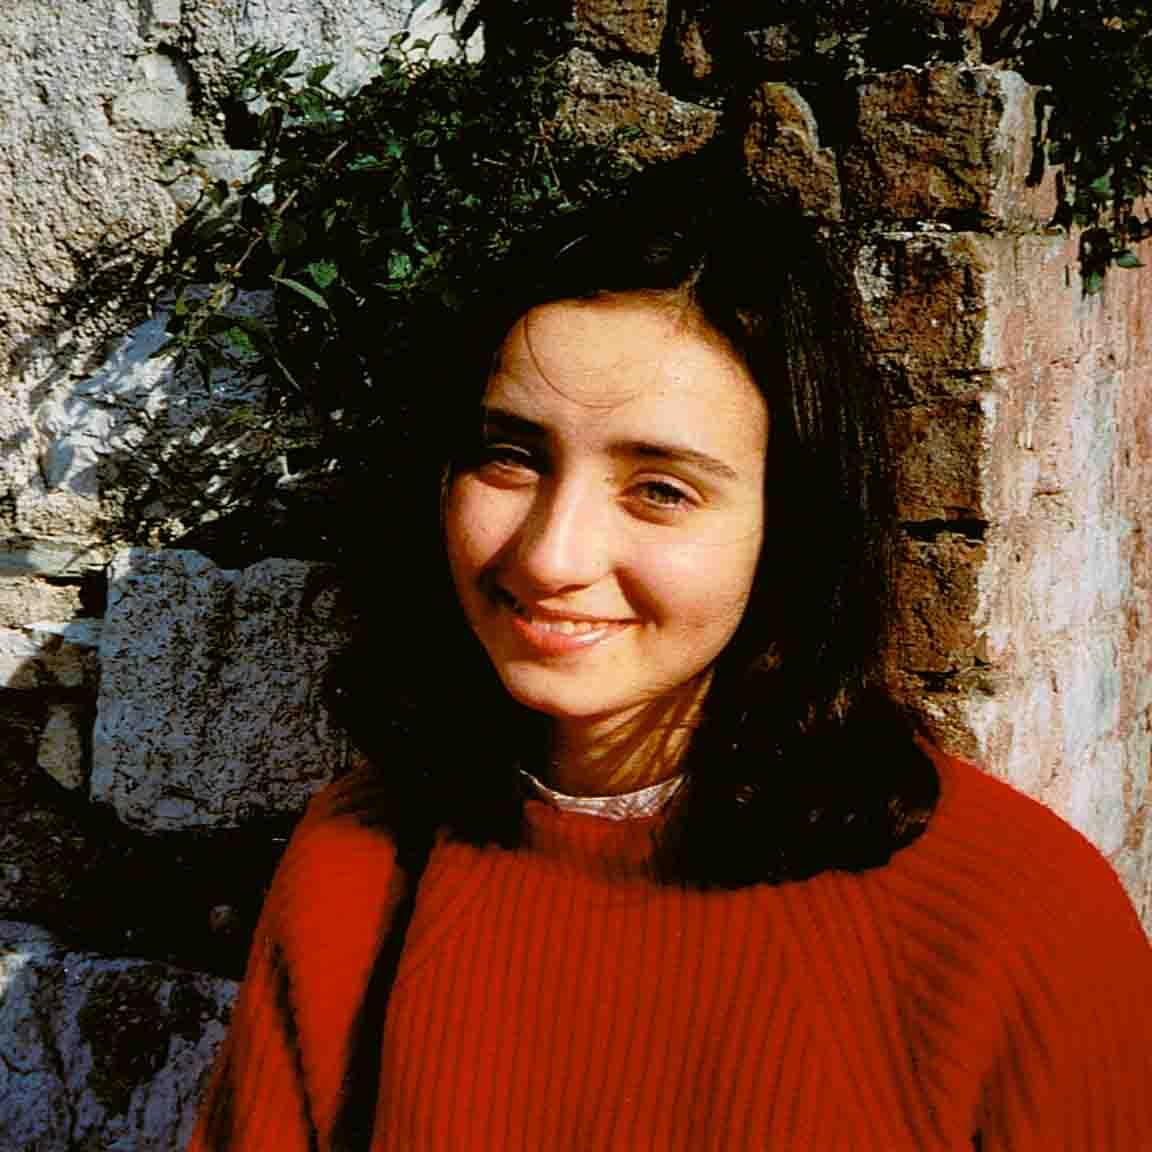 Venerabile Sandra Sabattini – 22 Novembre